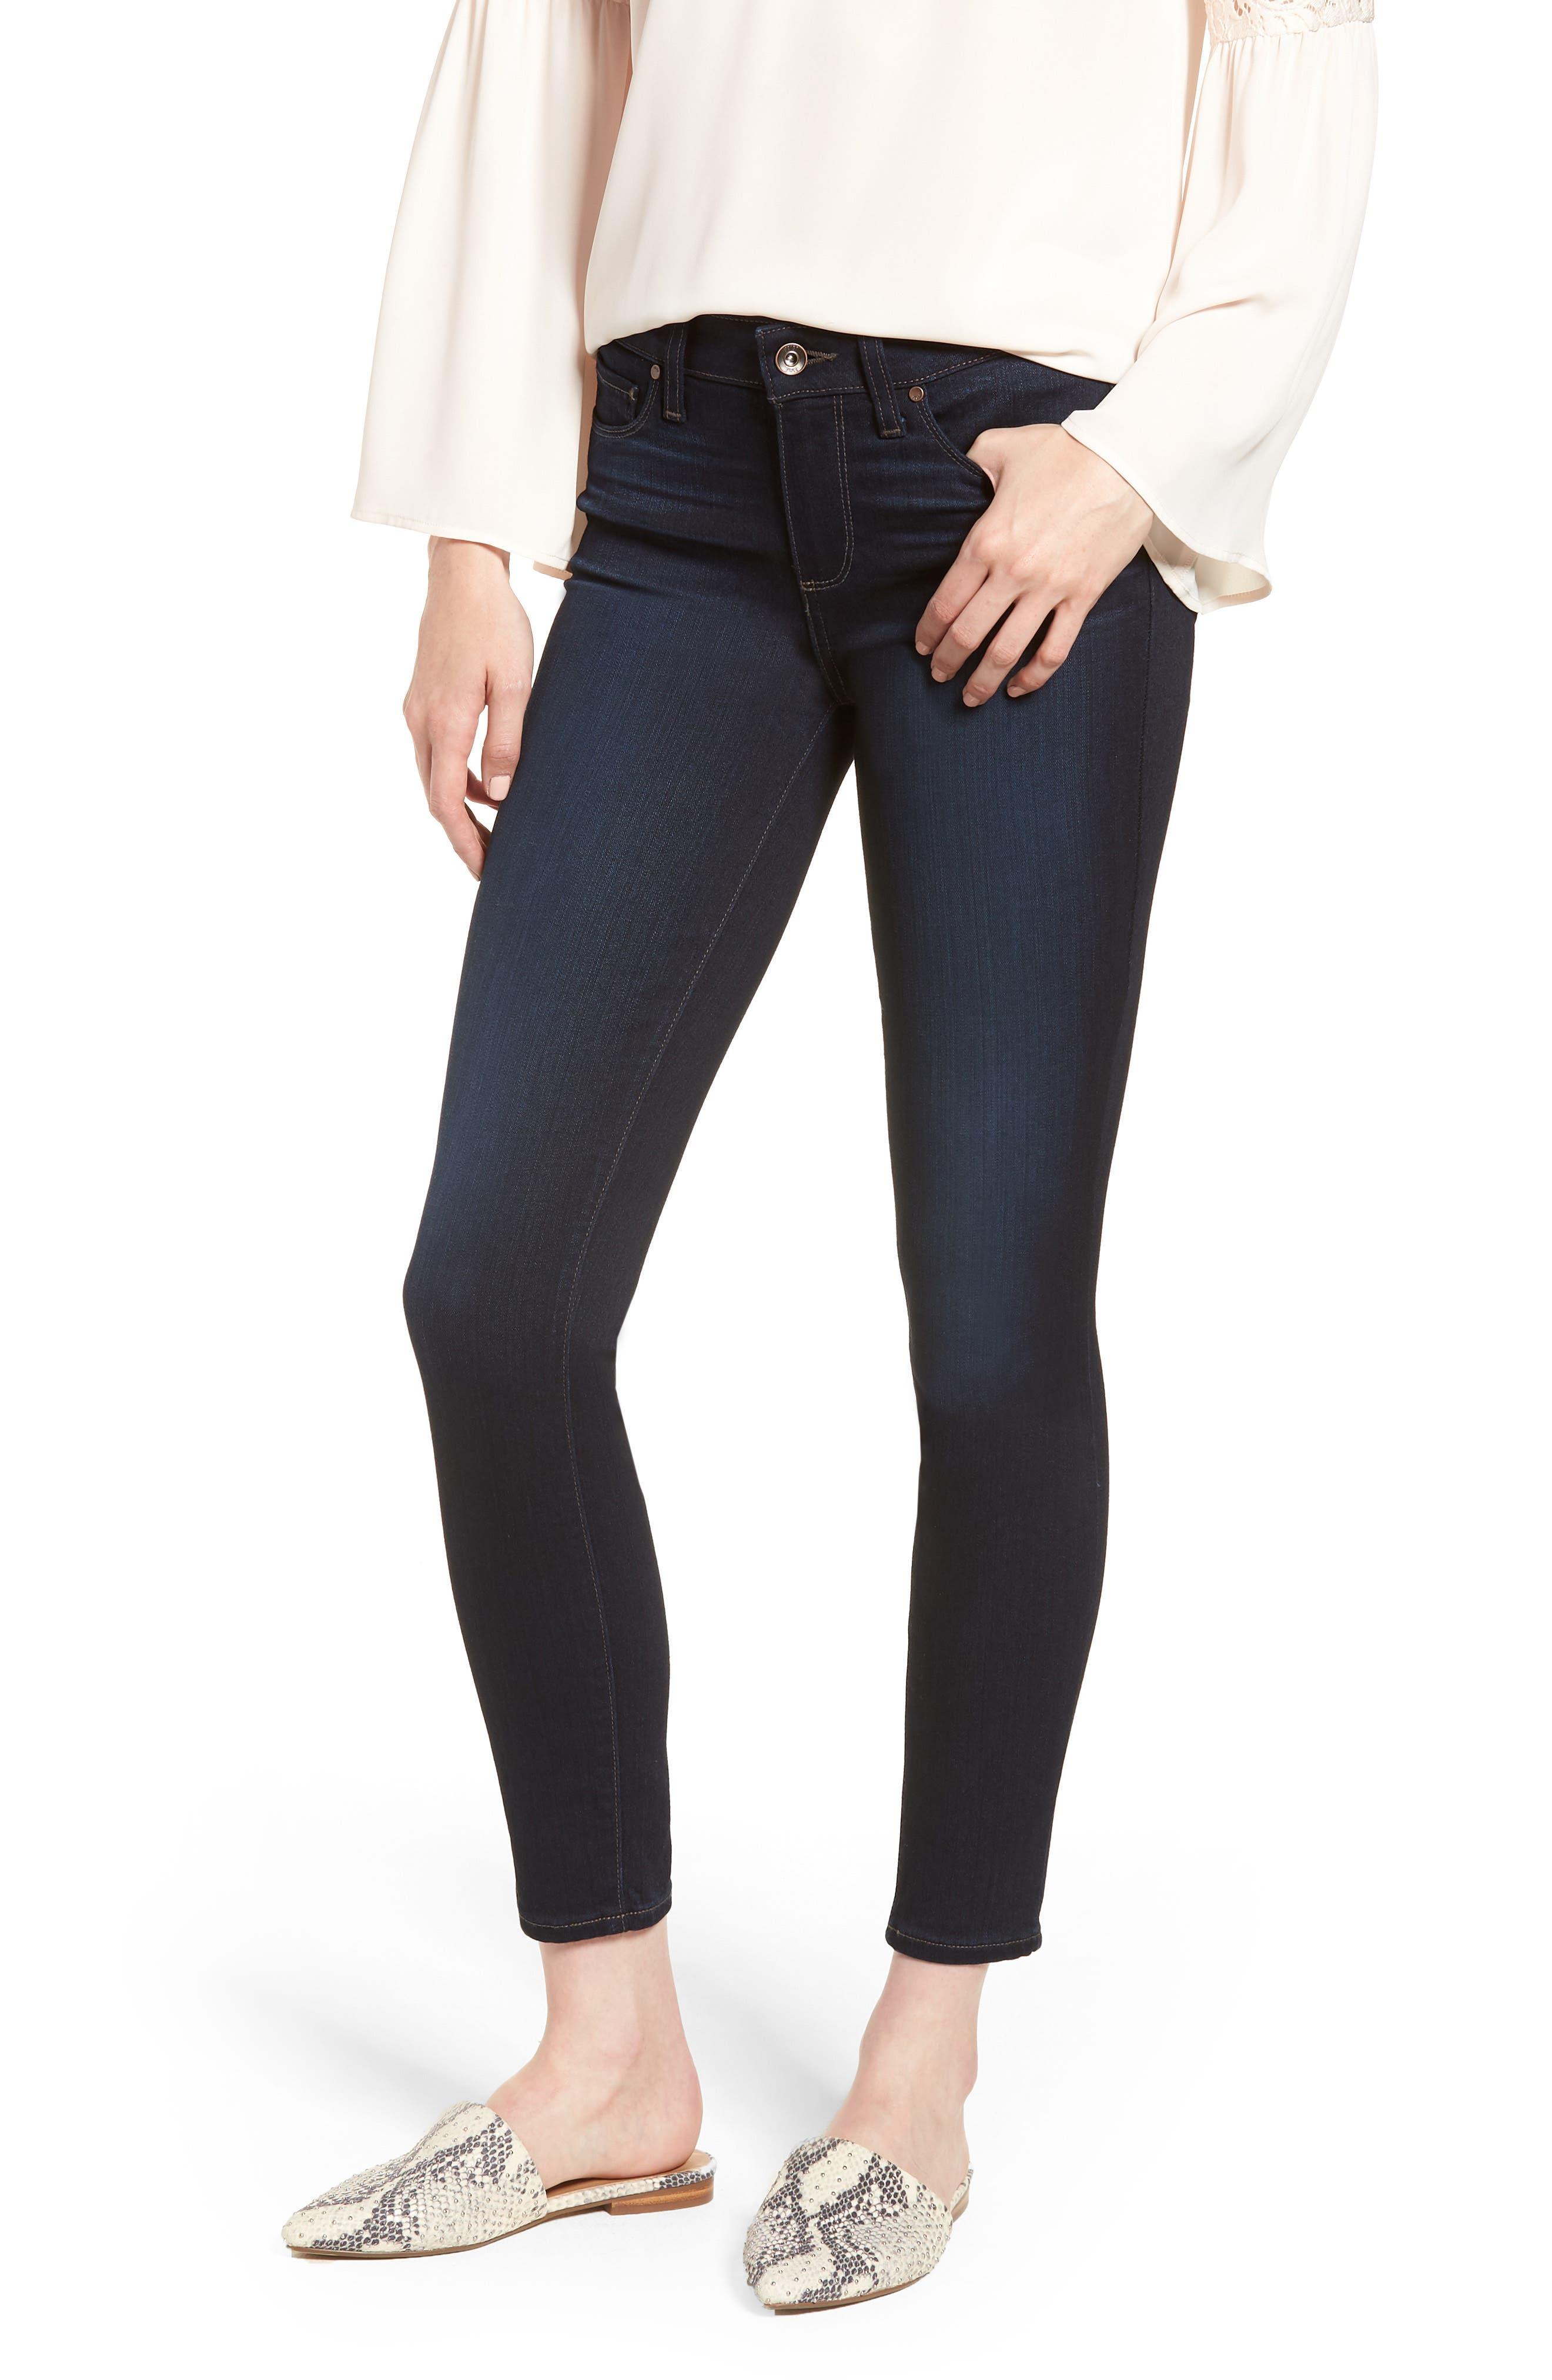 Transcend - Verdugo Ankle Skinny Jeans,                             Main thumbnail 1, color,                             RENNA